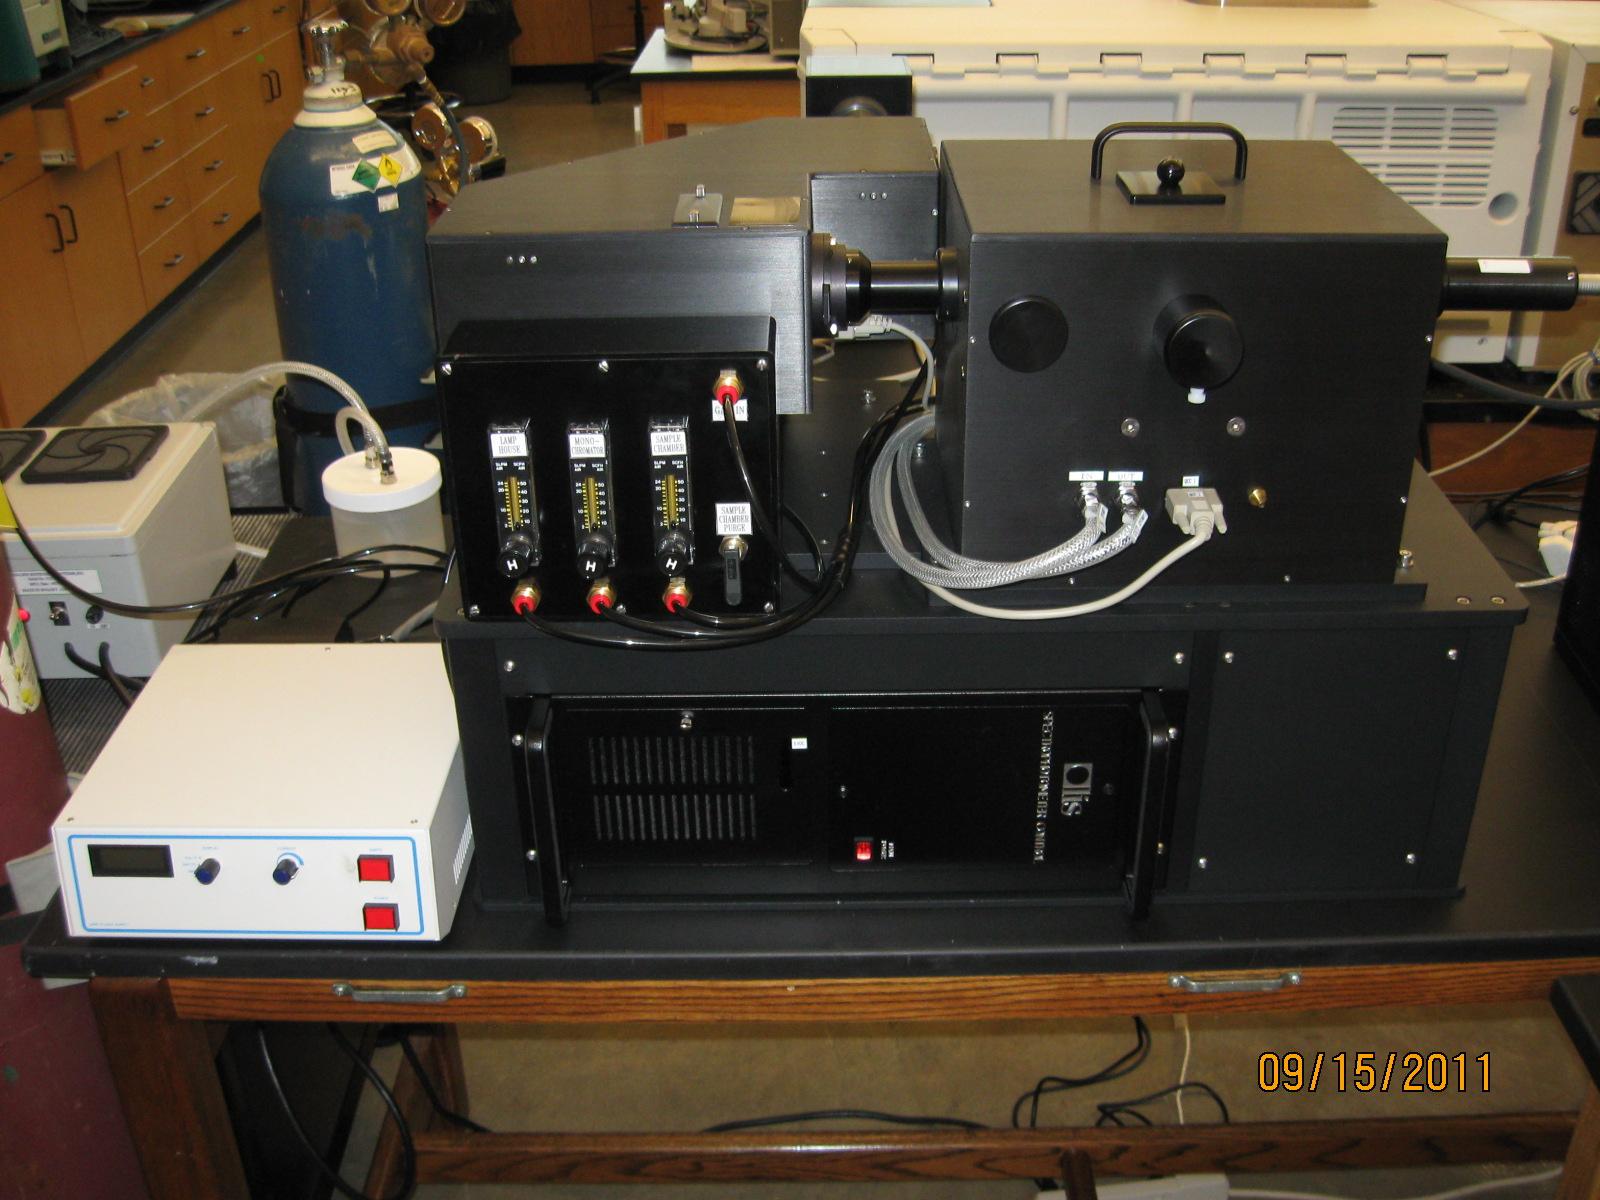 Olis Circular Dichorism Spectrometer